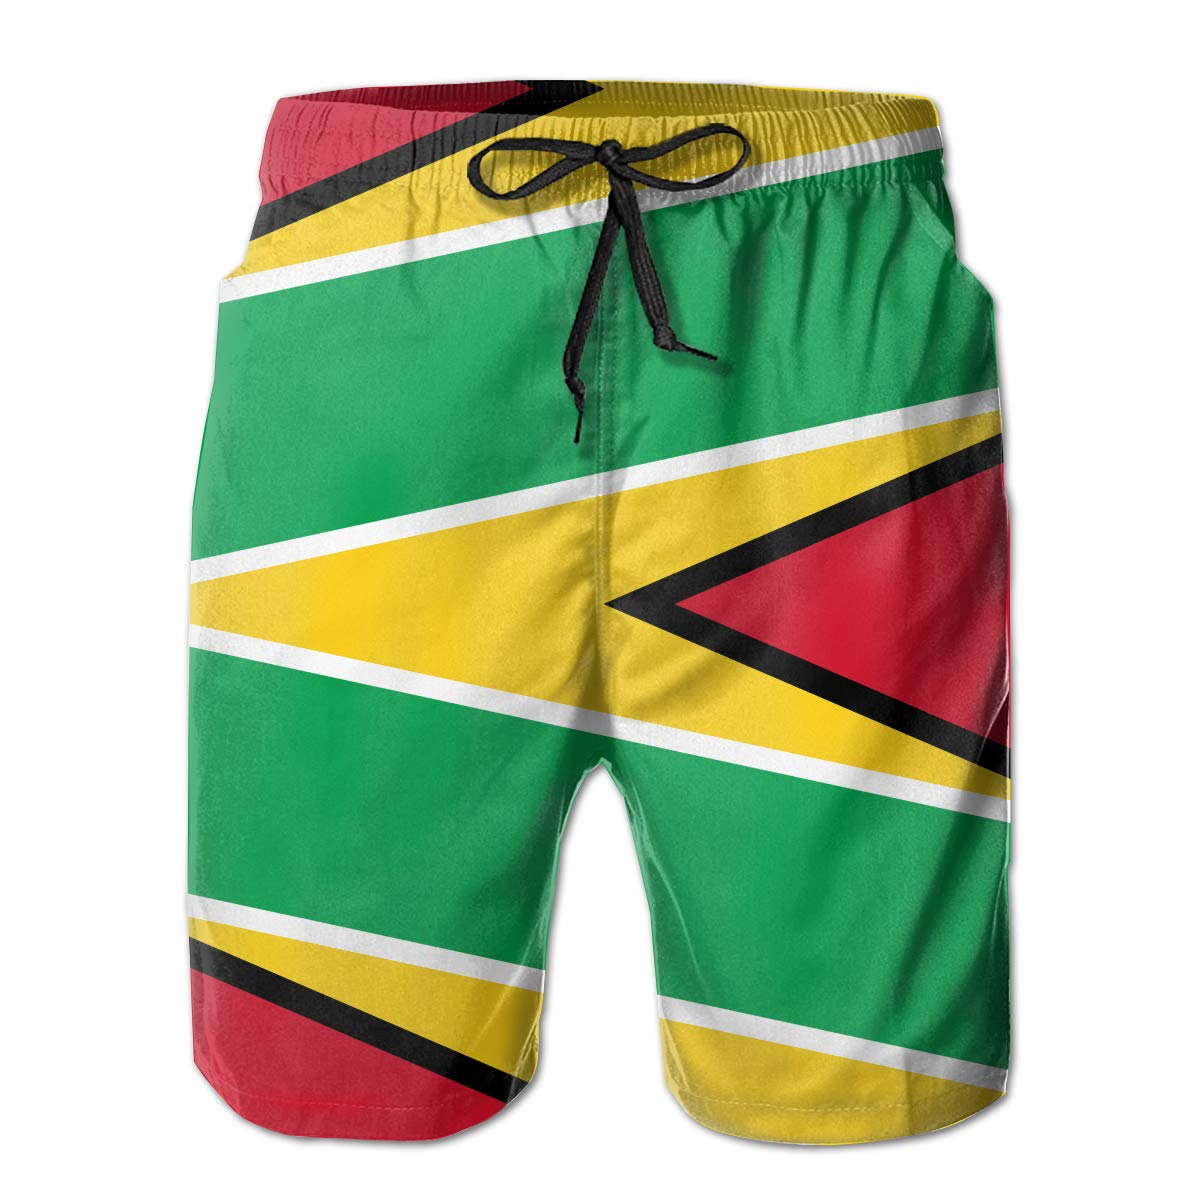 FASUWAVE Mens Swim Trunks Originality Guyana Flag Quick Dry Beach Board Shorts with Mesh Lining